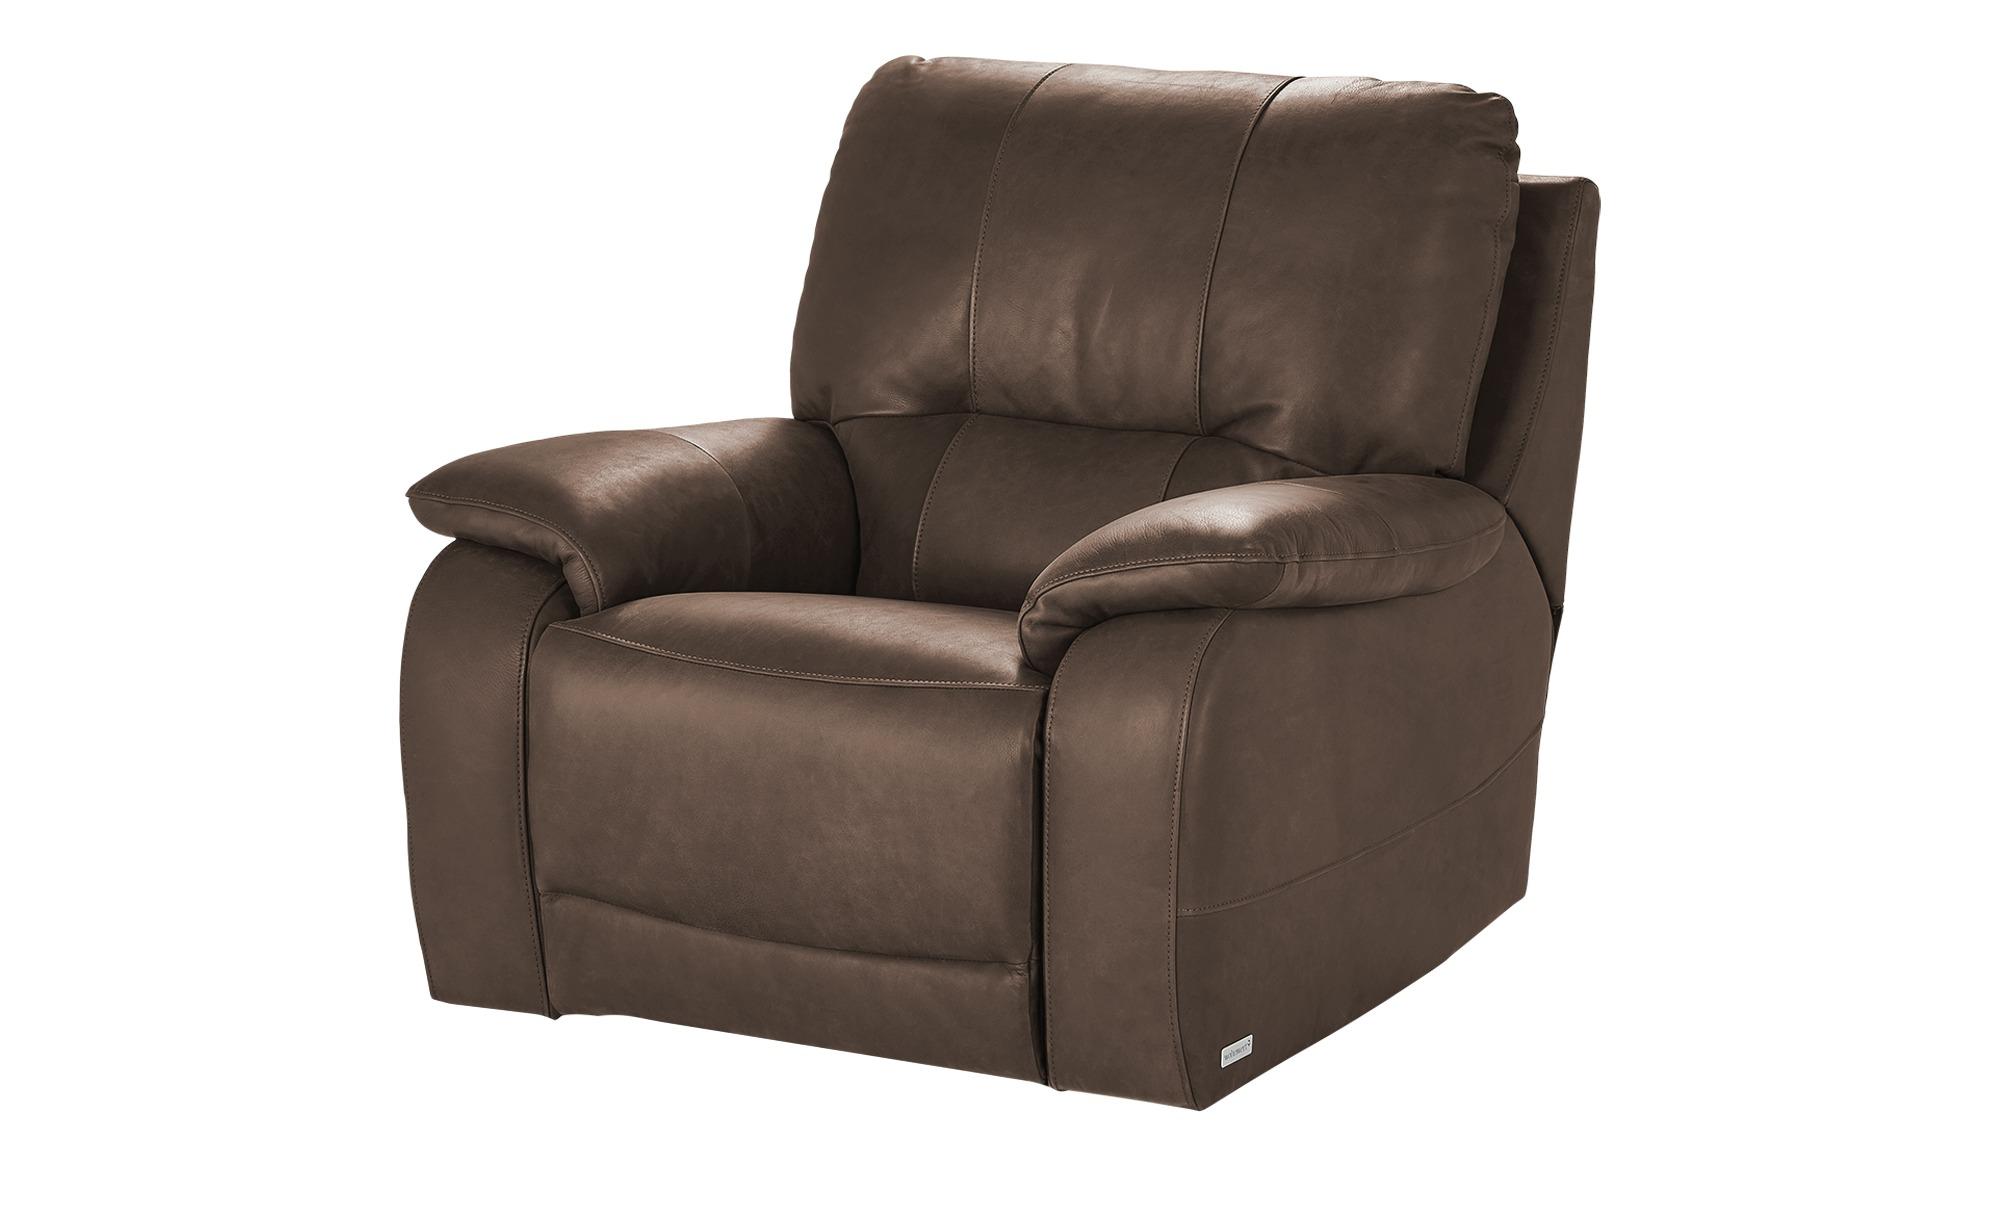 Wohnwert Relaxsessel  Adelma - braun - Polstermöbel > Sessel > Ledersessel günstig online kaufen